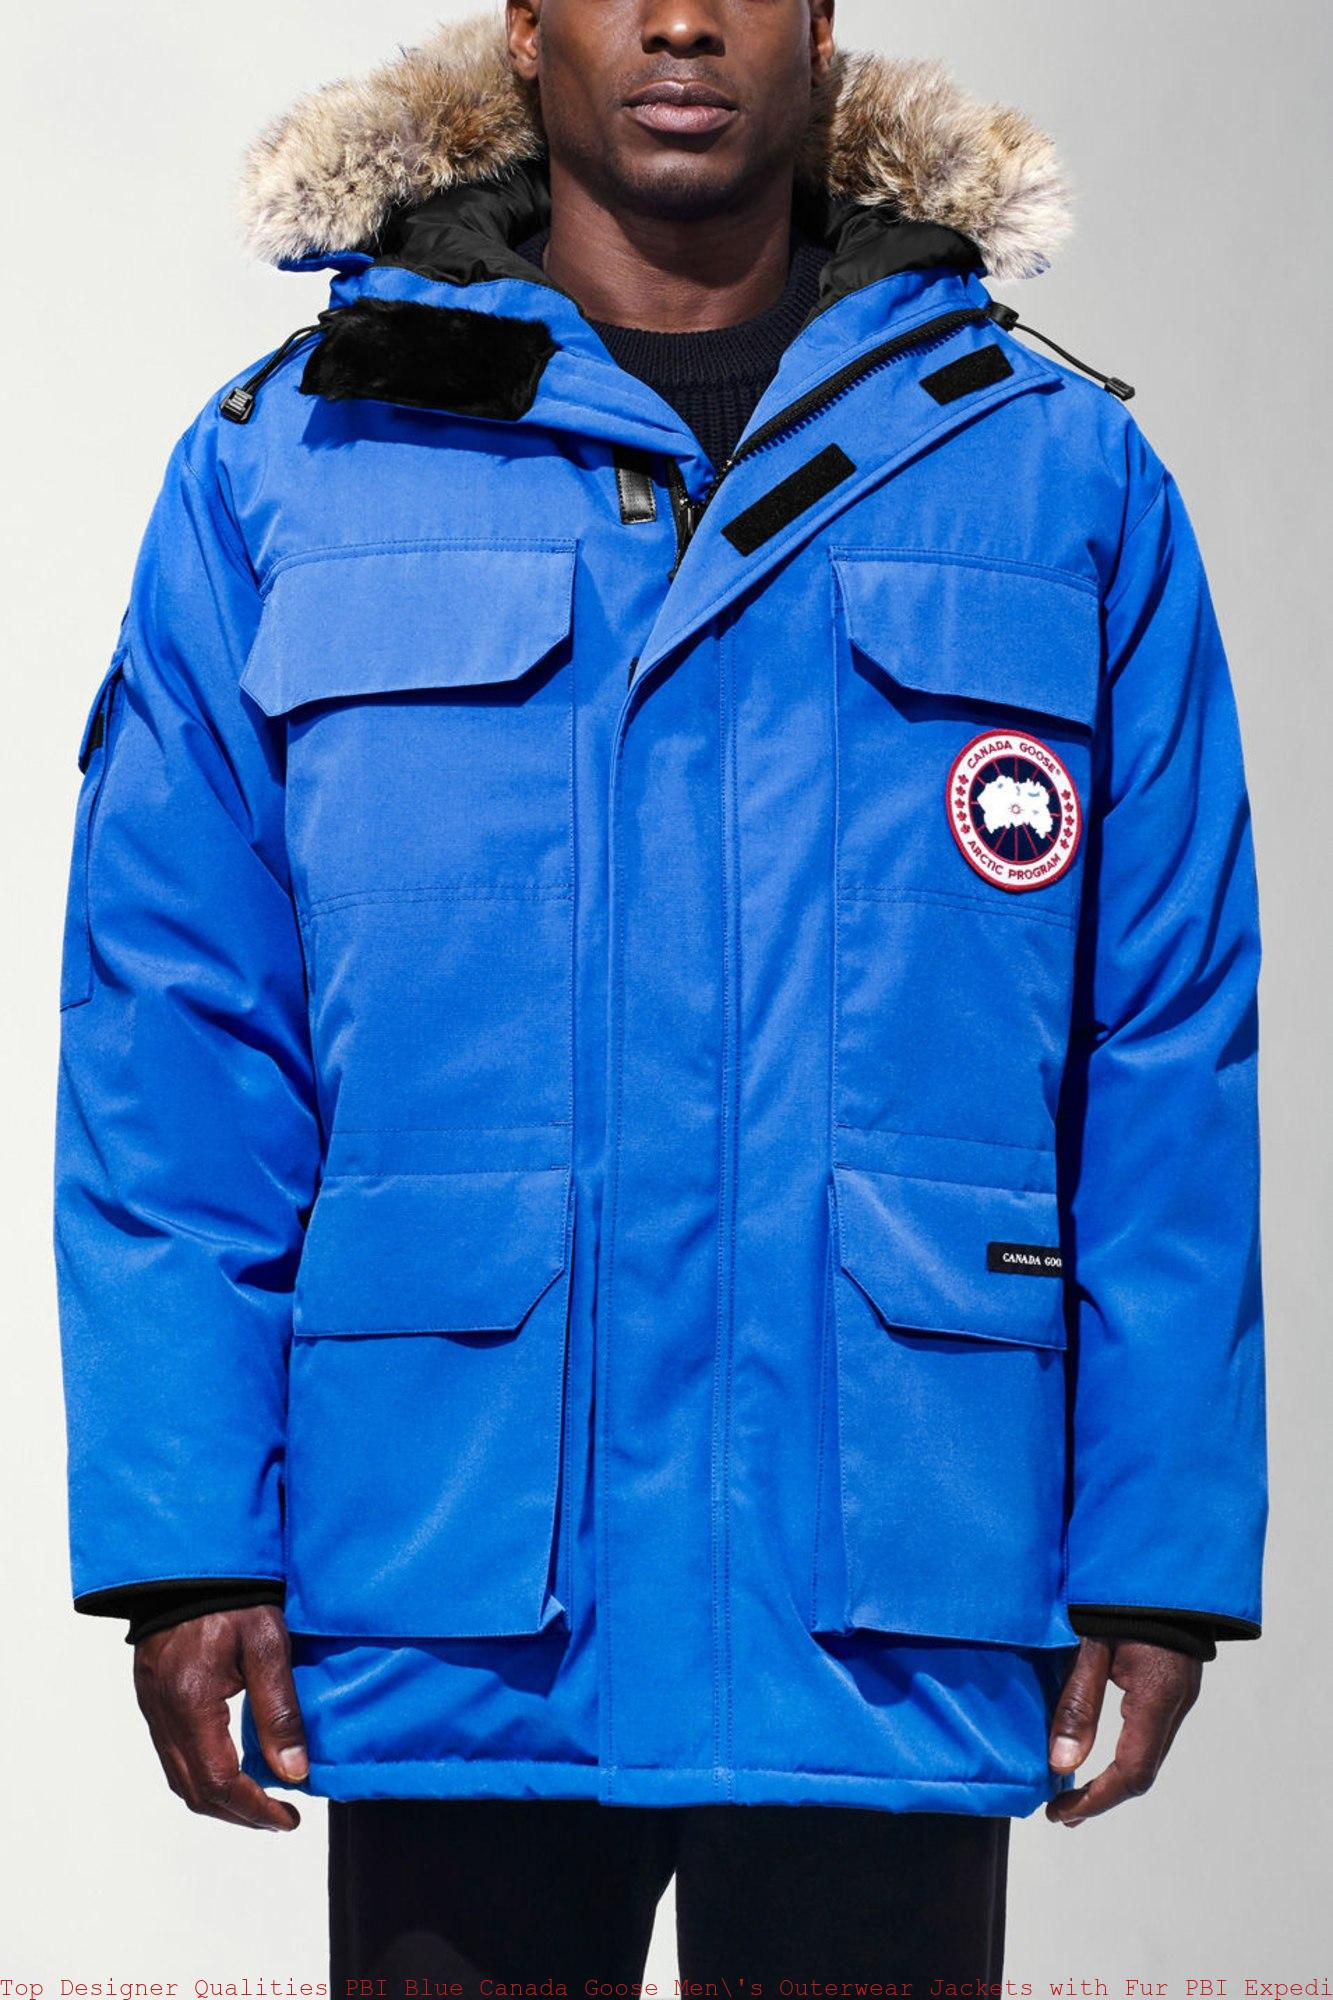 Top Designer Qualities PBI Blue Canada Goose Men's Outerwear Jackets with Fur PBI Expedition Parka Canada Goose Trillium Parka Uk 4565MPB